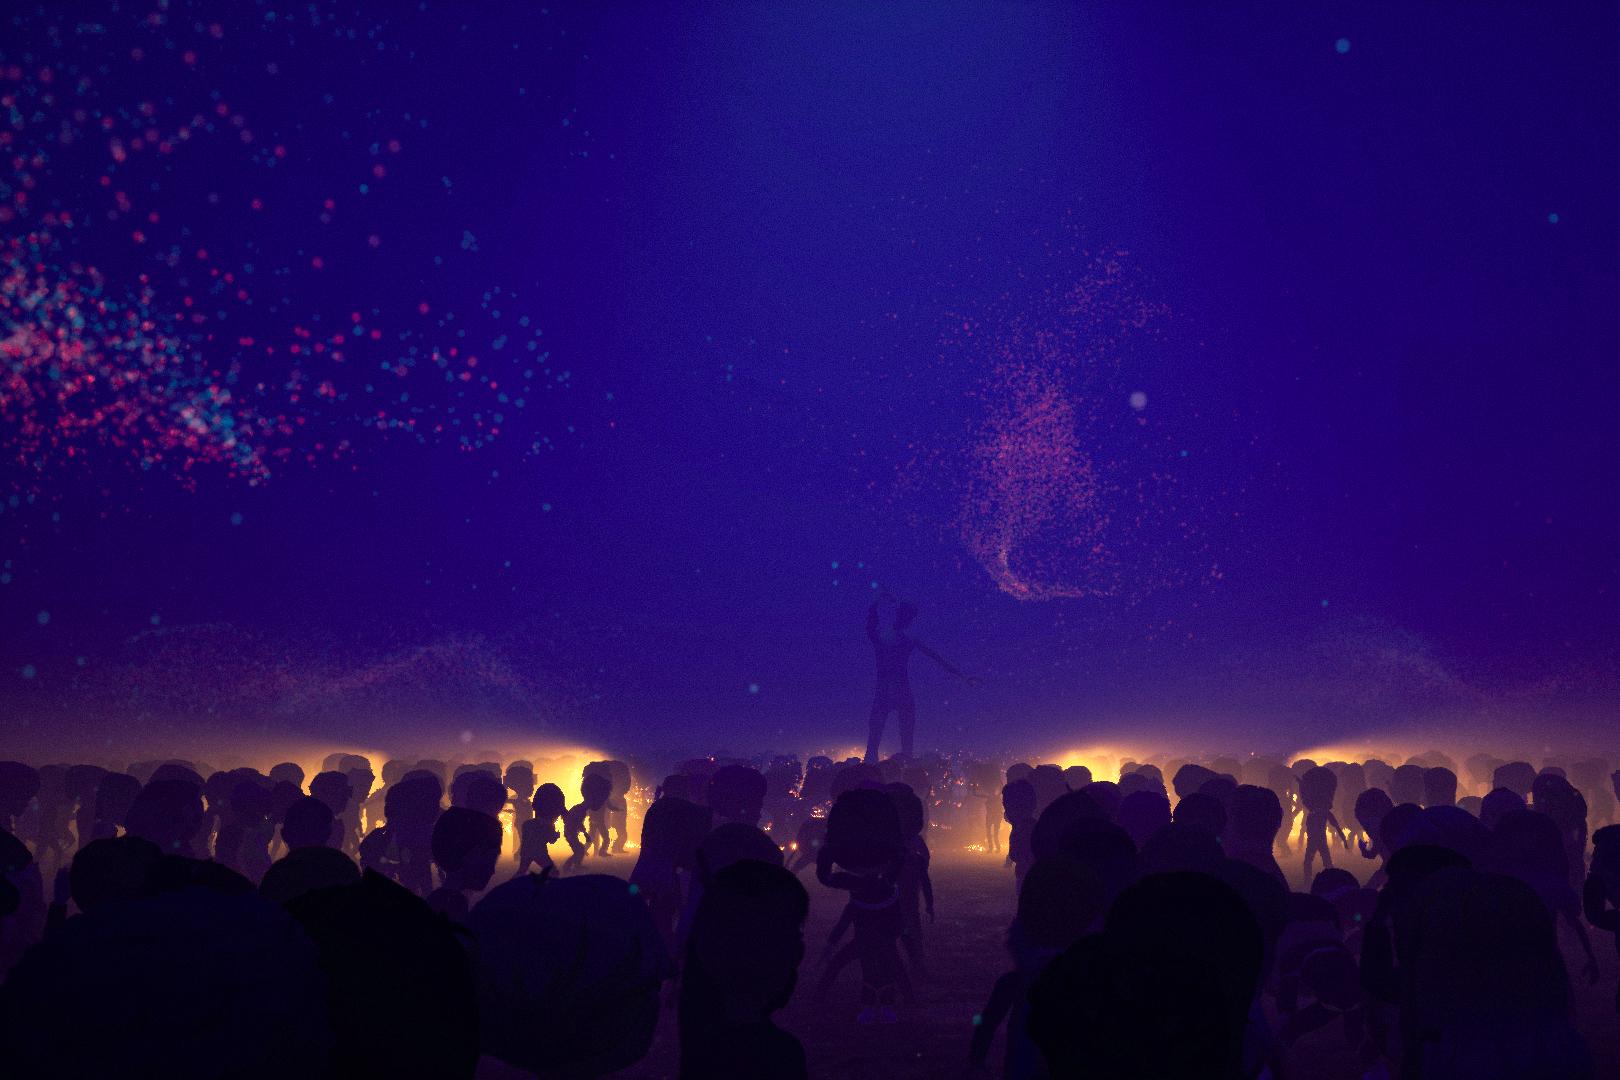 Icelands Thingvellir virtual stage